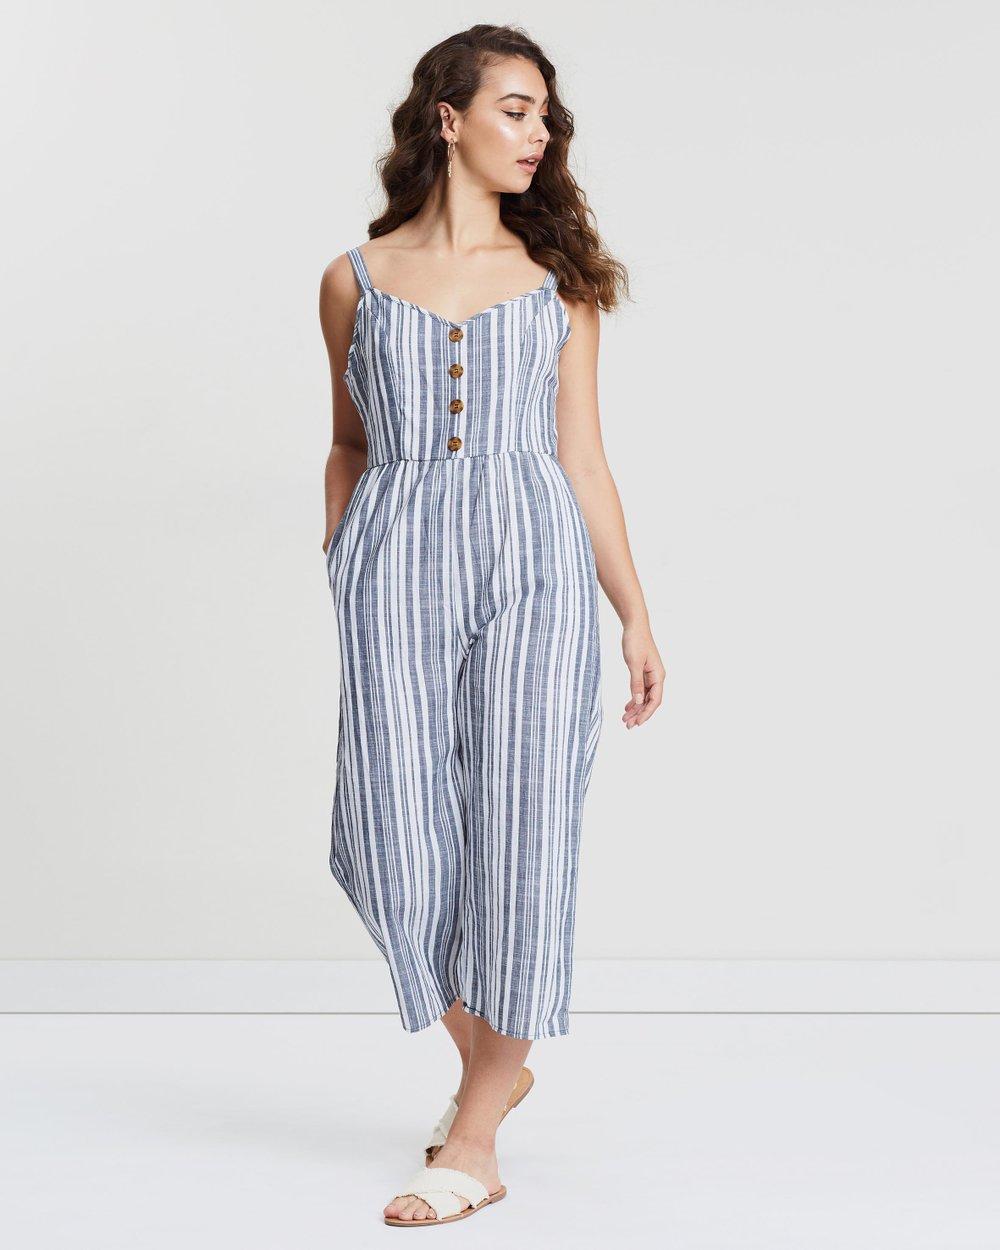 d5155de6be5 Woven Toni Strappy Jumpsuit by Cotton On Online